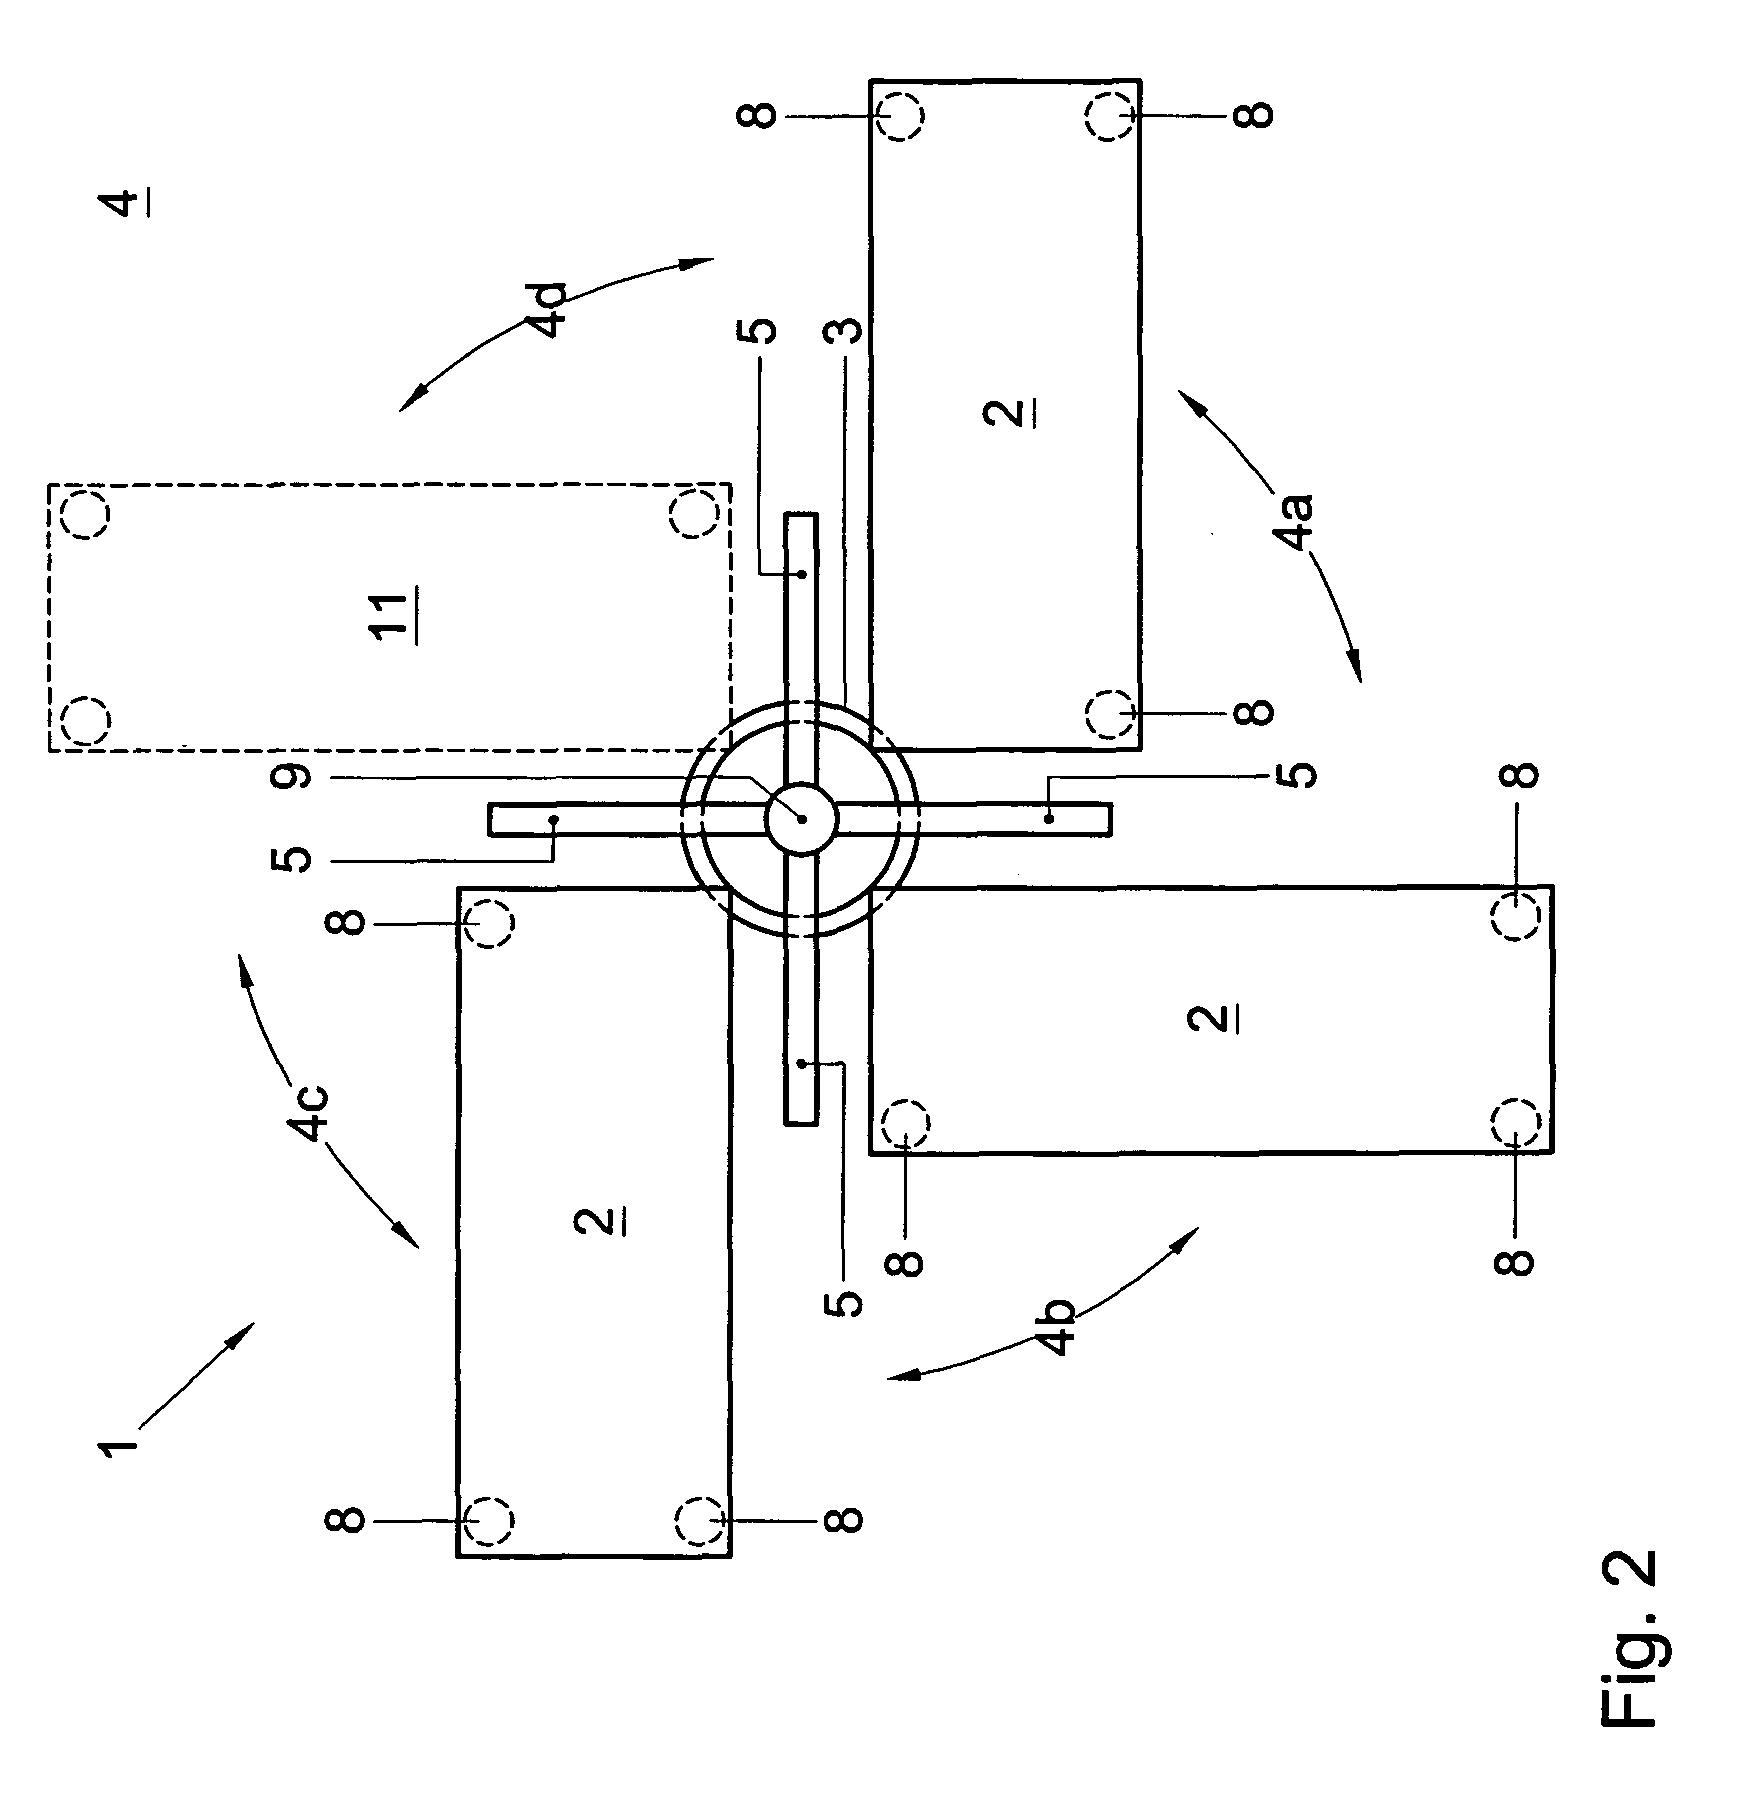 office desk layouts. patent drawing office desk layouts e